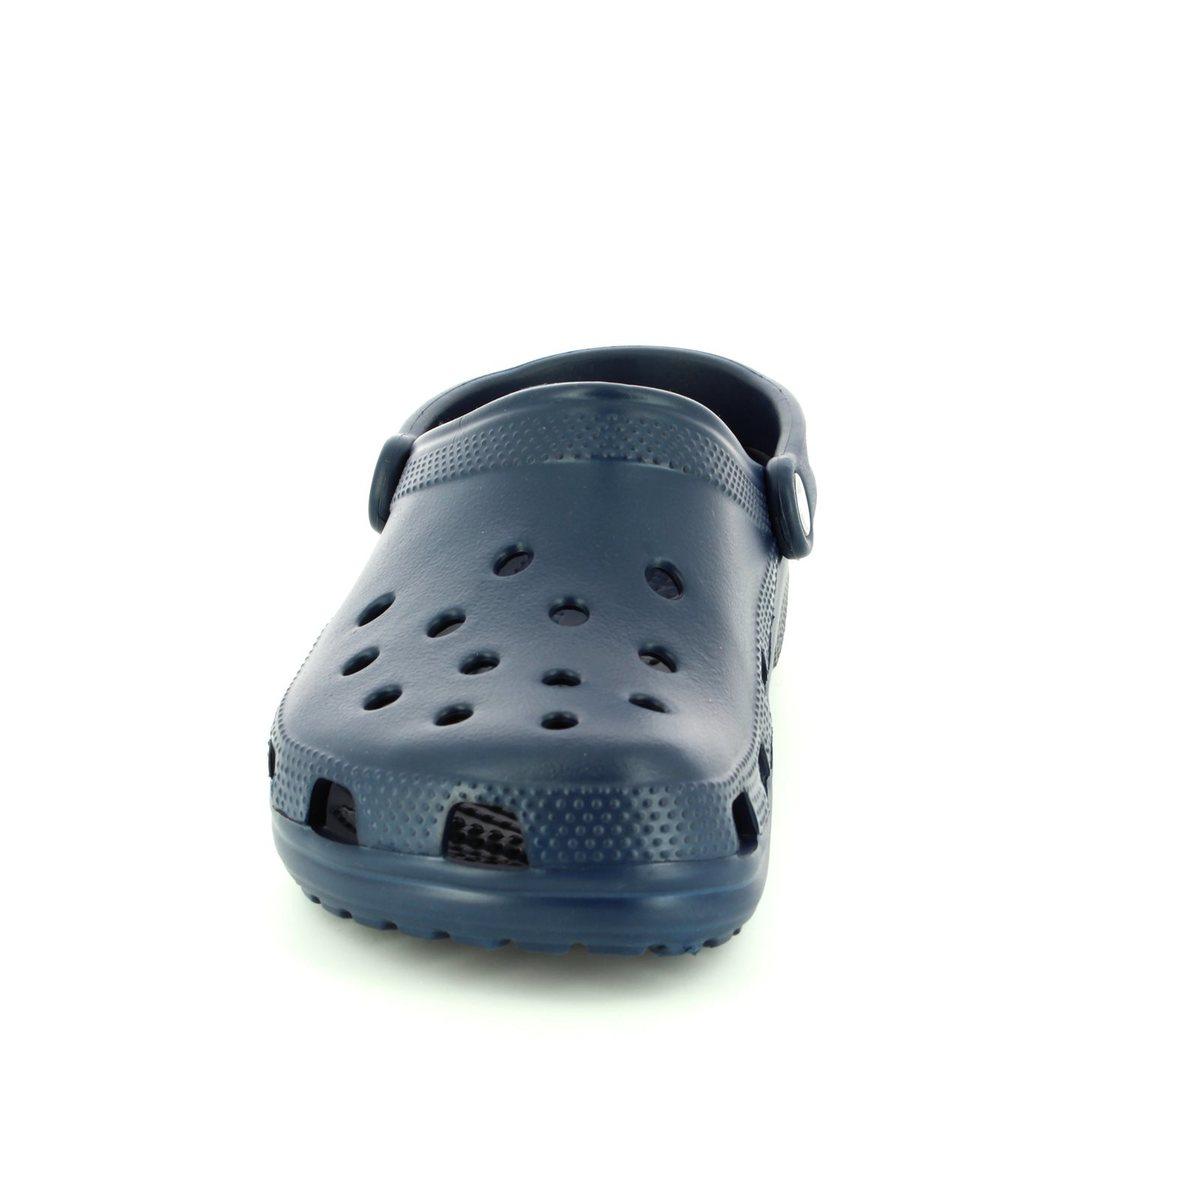 bf7ab516d Crocs Mens   Womens - Navy - 10001 410 CLASSIC